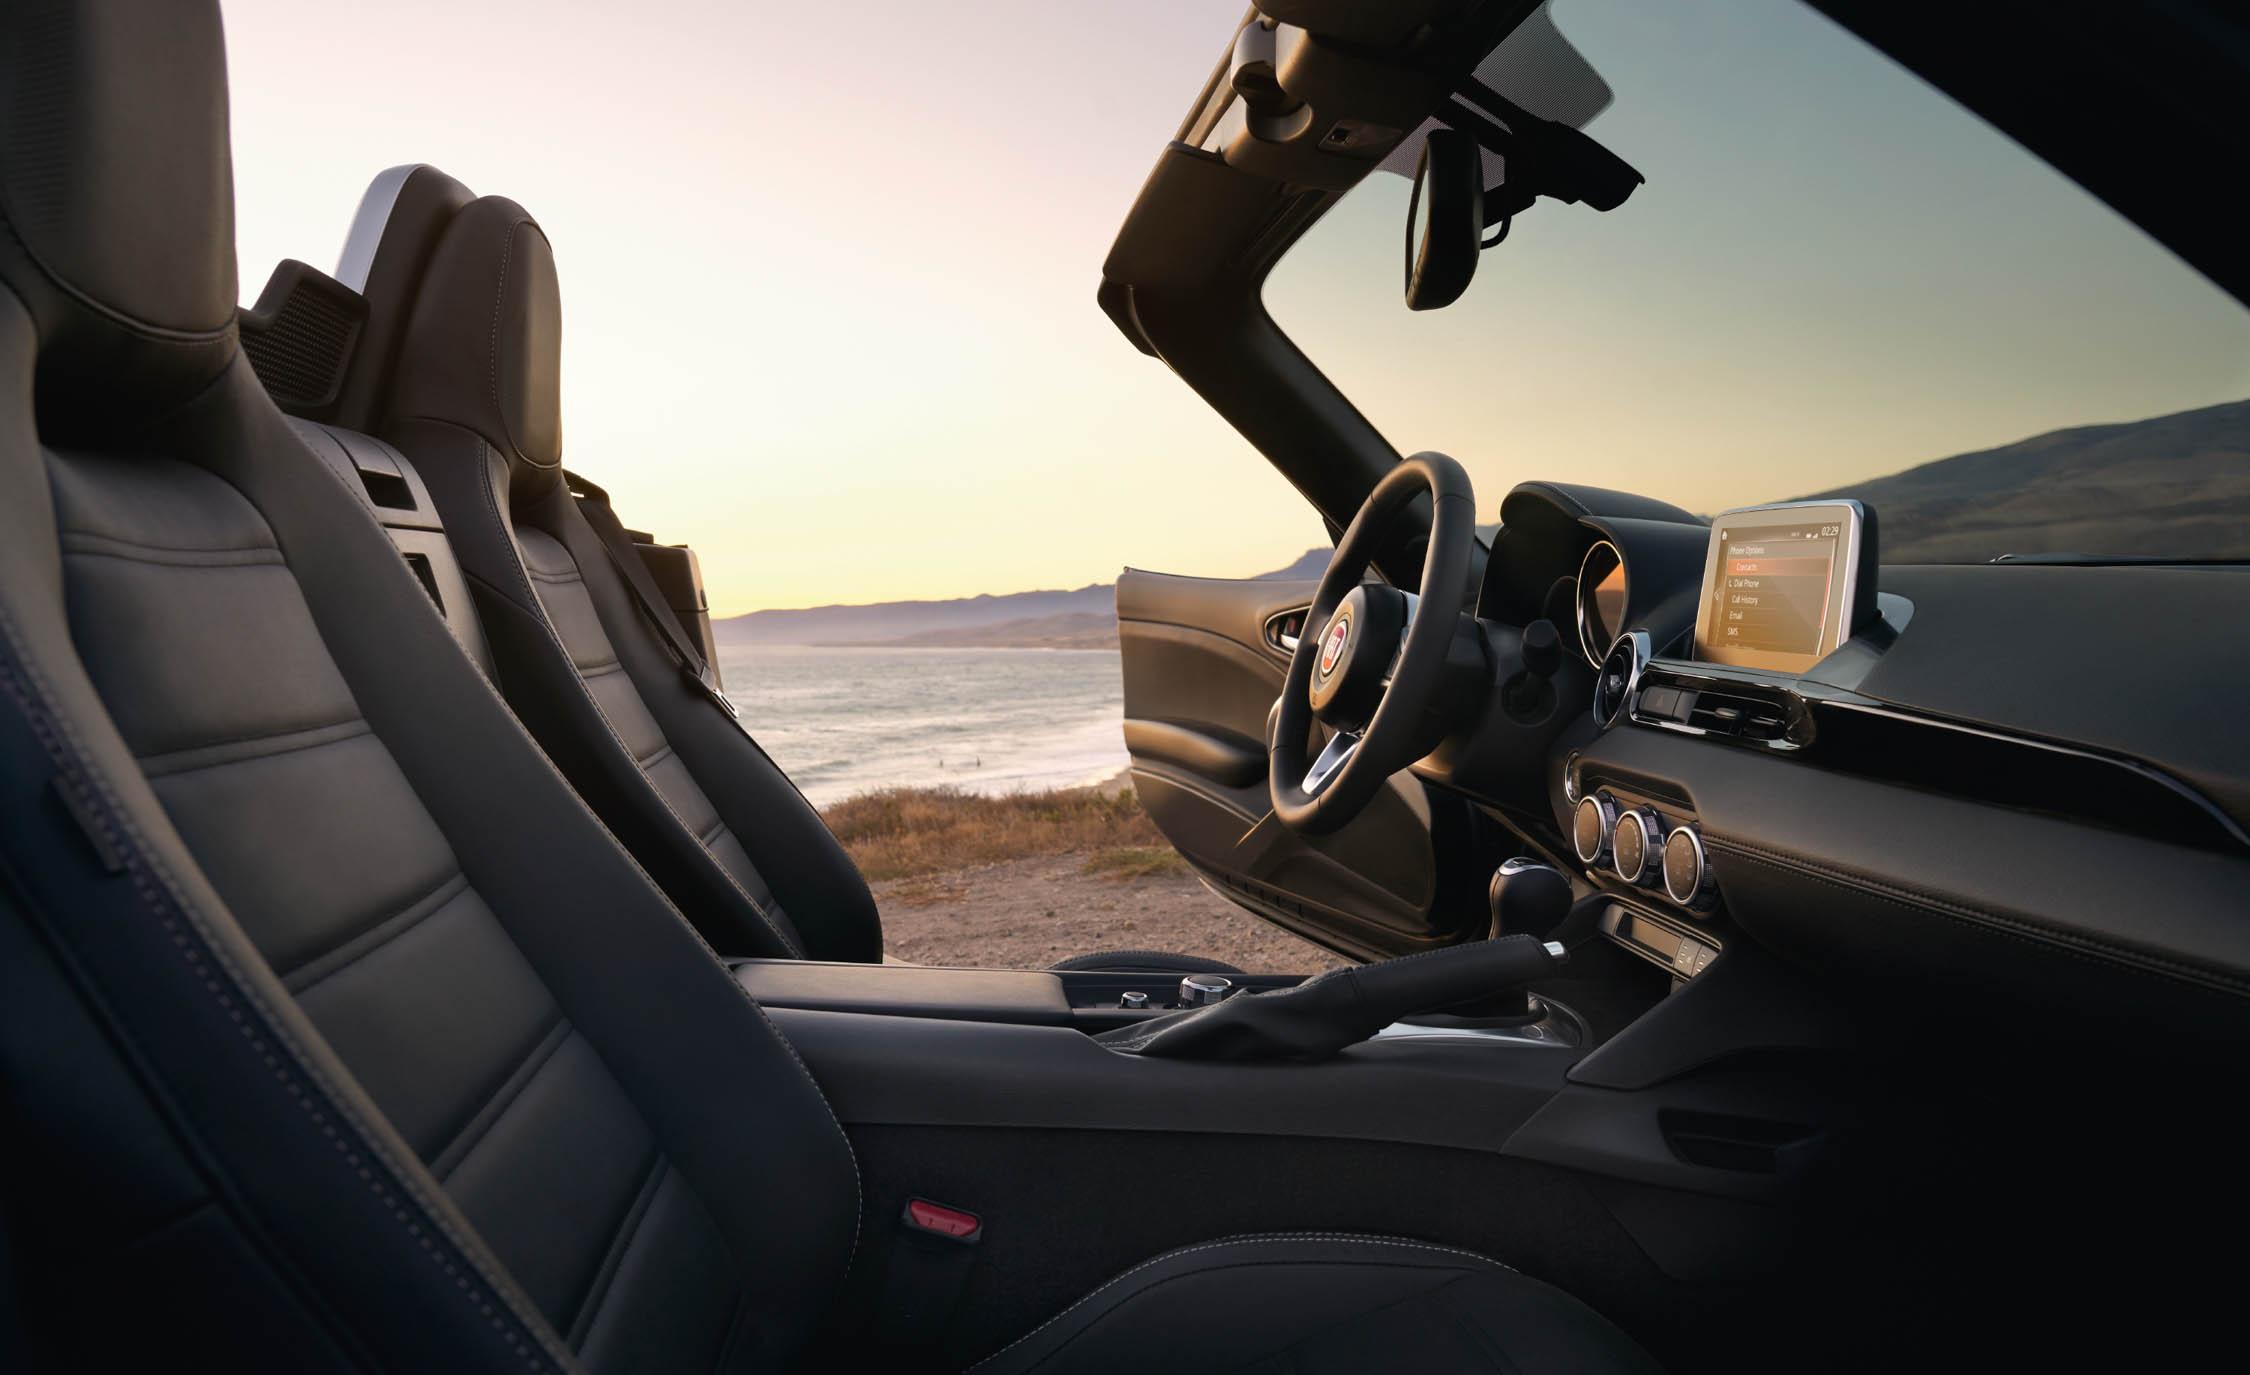 2017 Fiat 124 Spider Interior Seats (View 8 of 23)